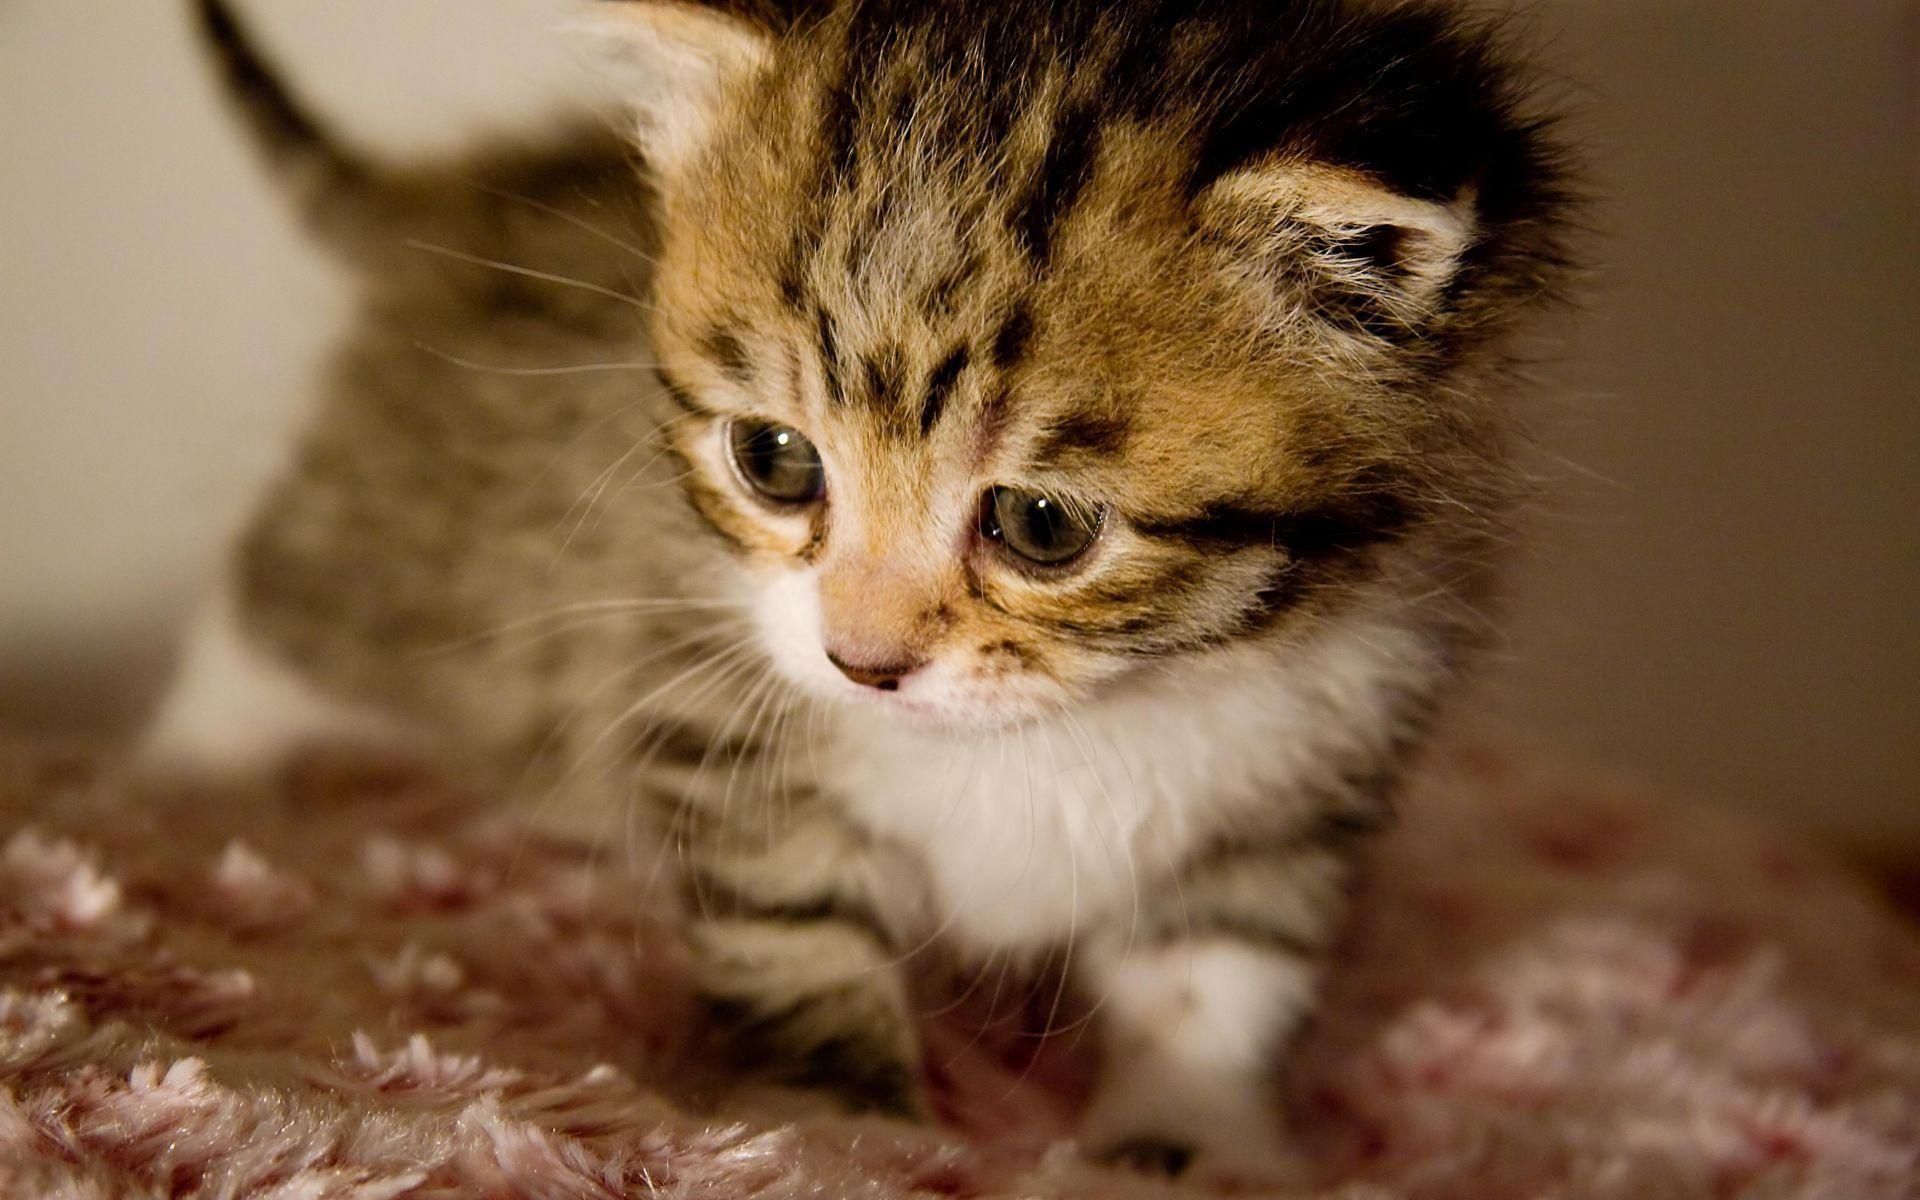 Cute Kitten Backgrounds Wallpaper | Wallpaper Download